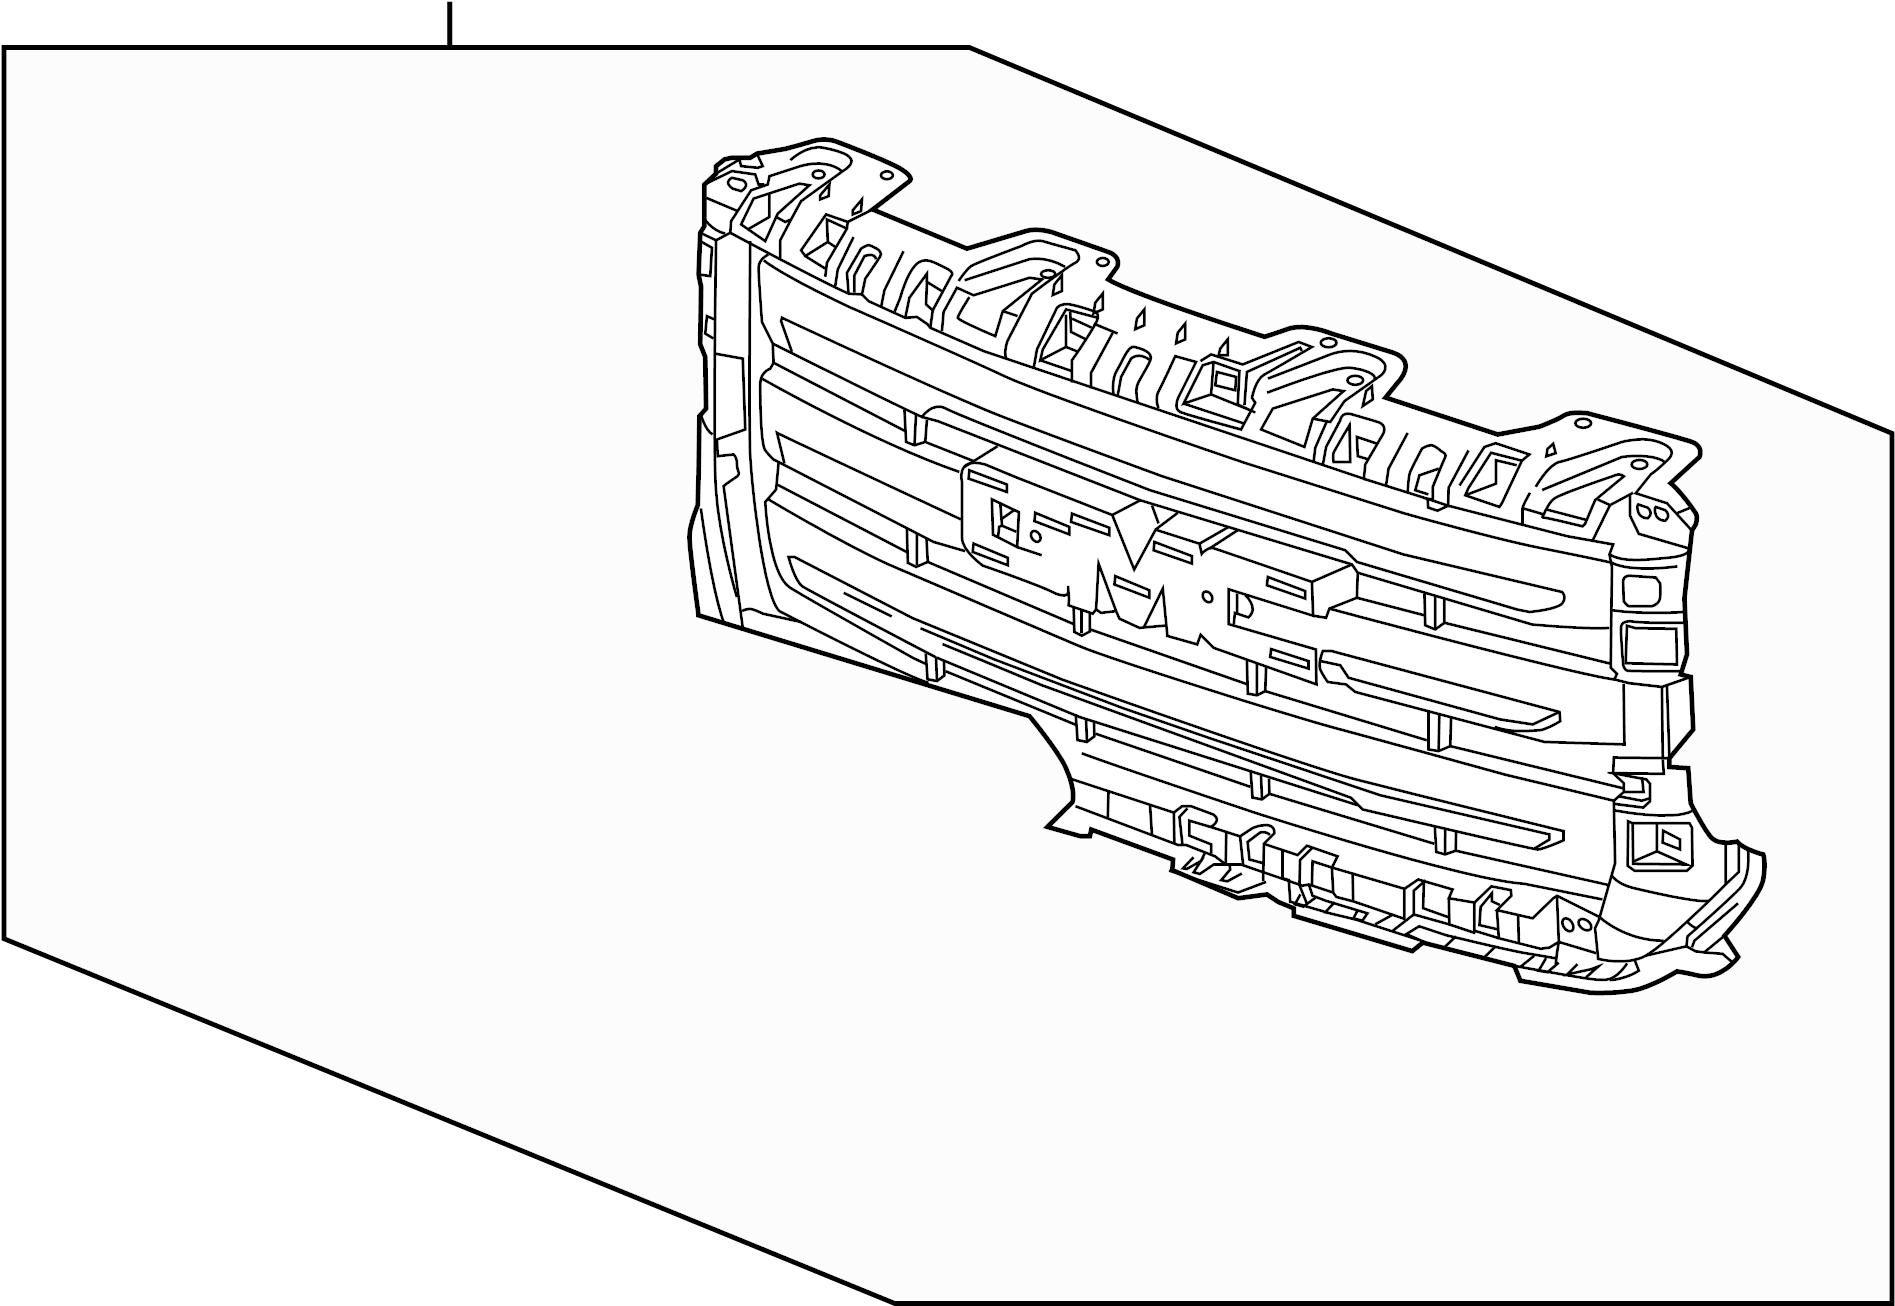 Gmc Sierra Slt 5 3l Flex V8 Automatic Grille